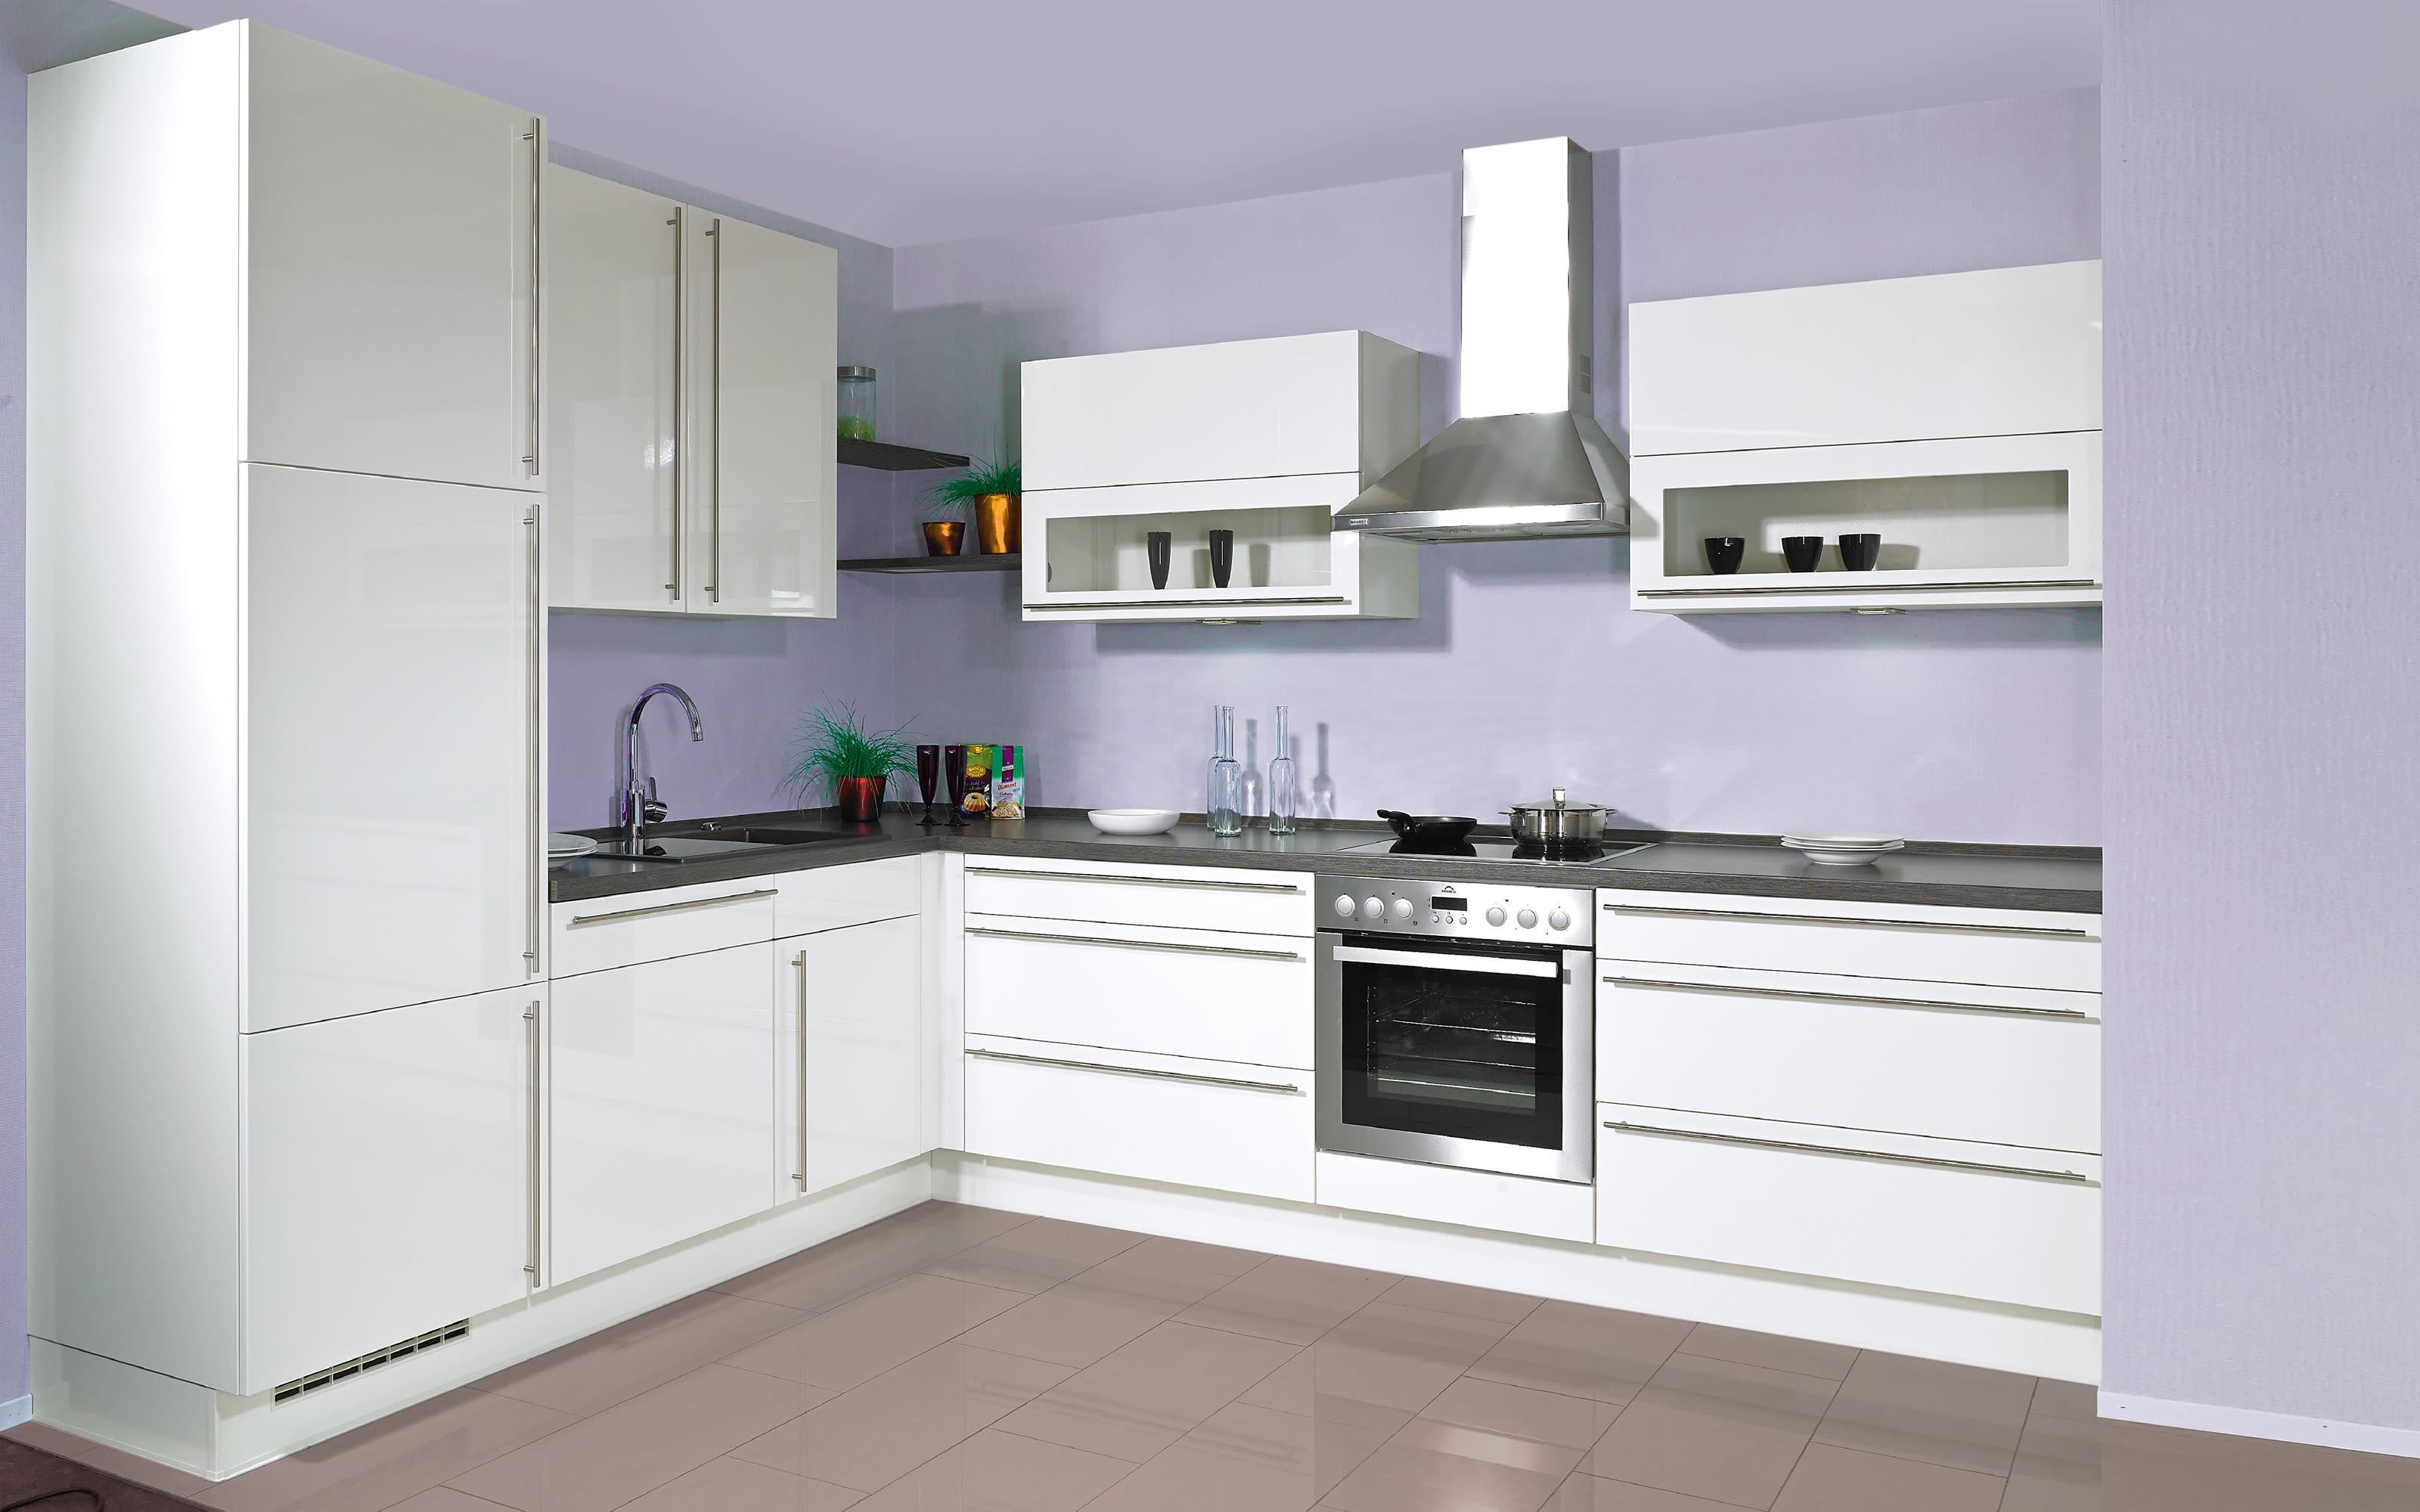 Einbauküche Flash, Lacklaminat Hochglanz magnolia, inklusive Elektrogeräte